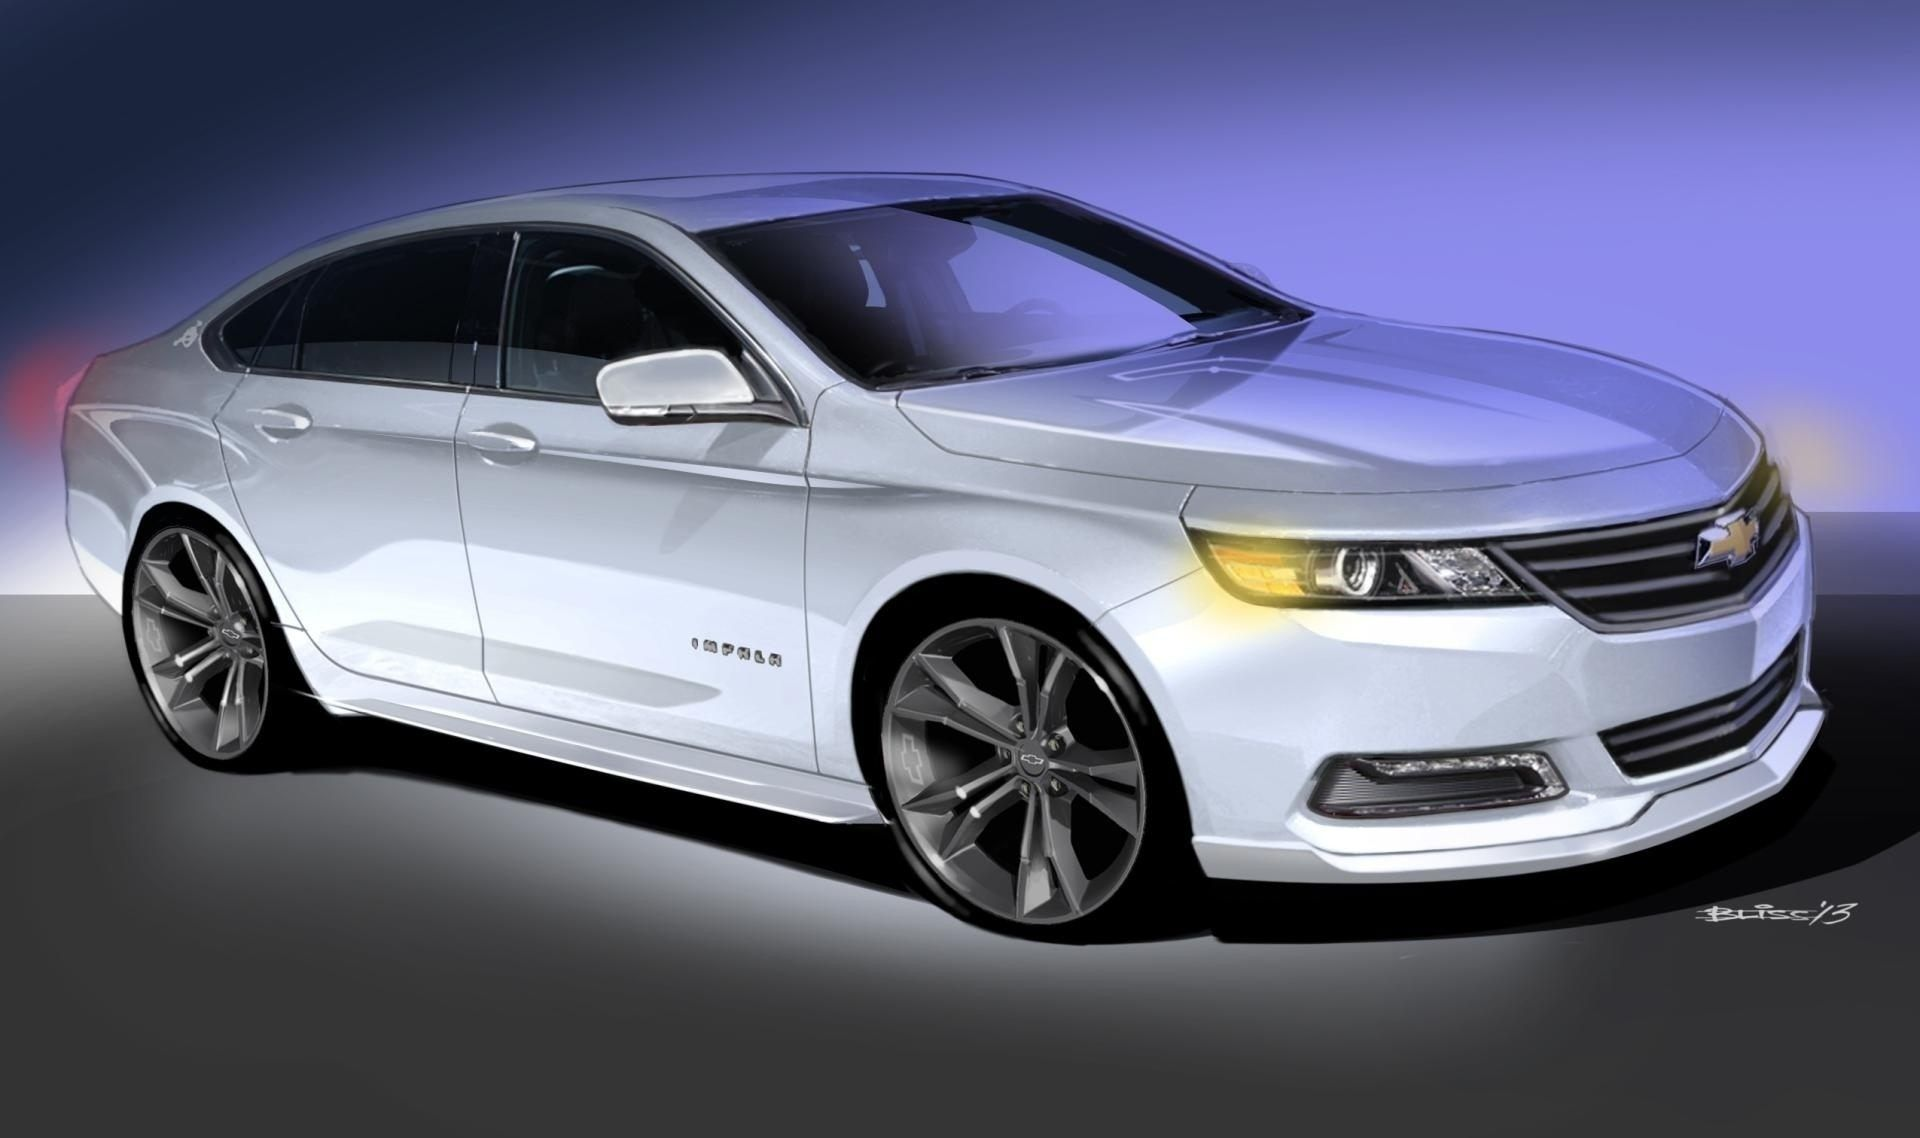 2019 Impala Ltz Price And Release Date Impala Ltz Chevy Impala